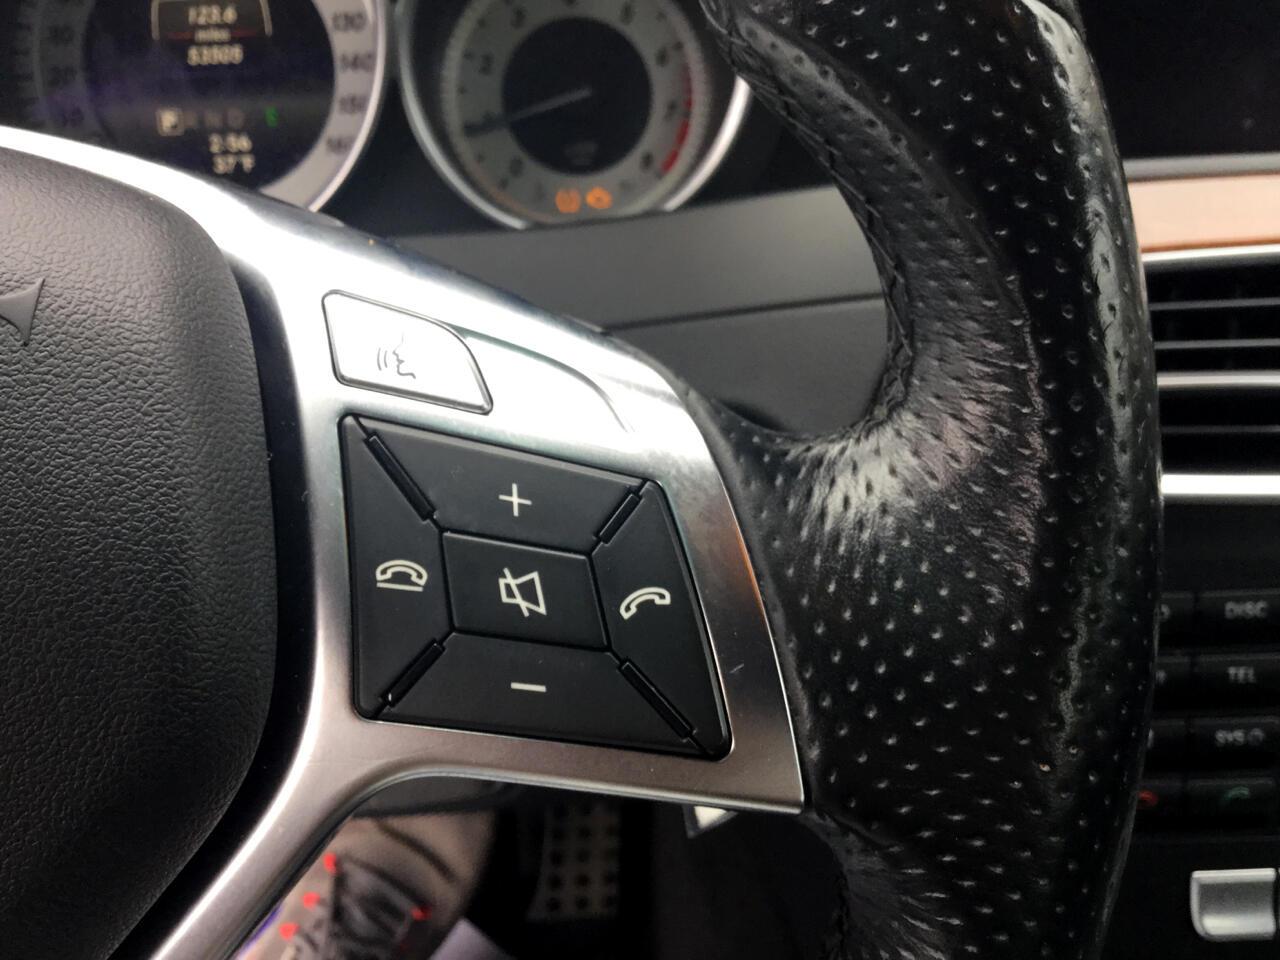 2014 Mercedes-Benz C-Class 4dr Sdn C 250 Sport RWD